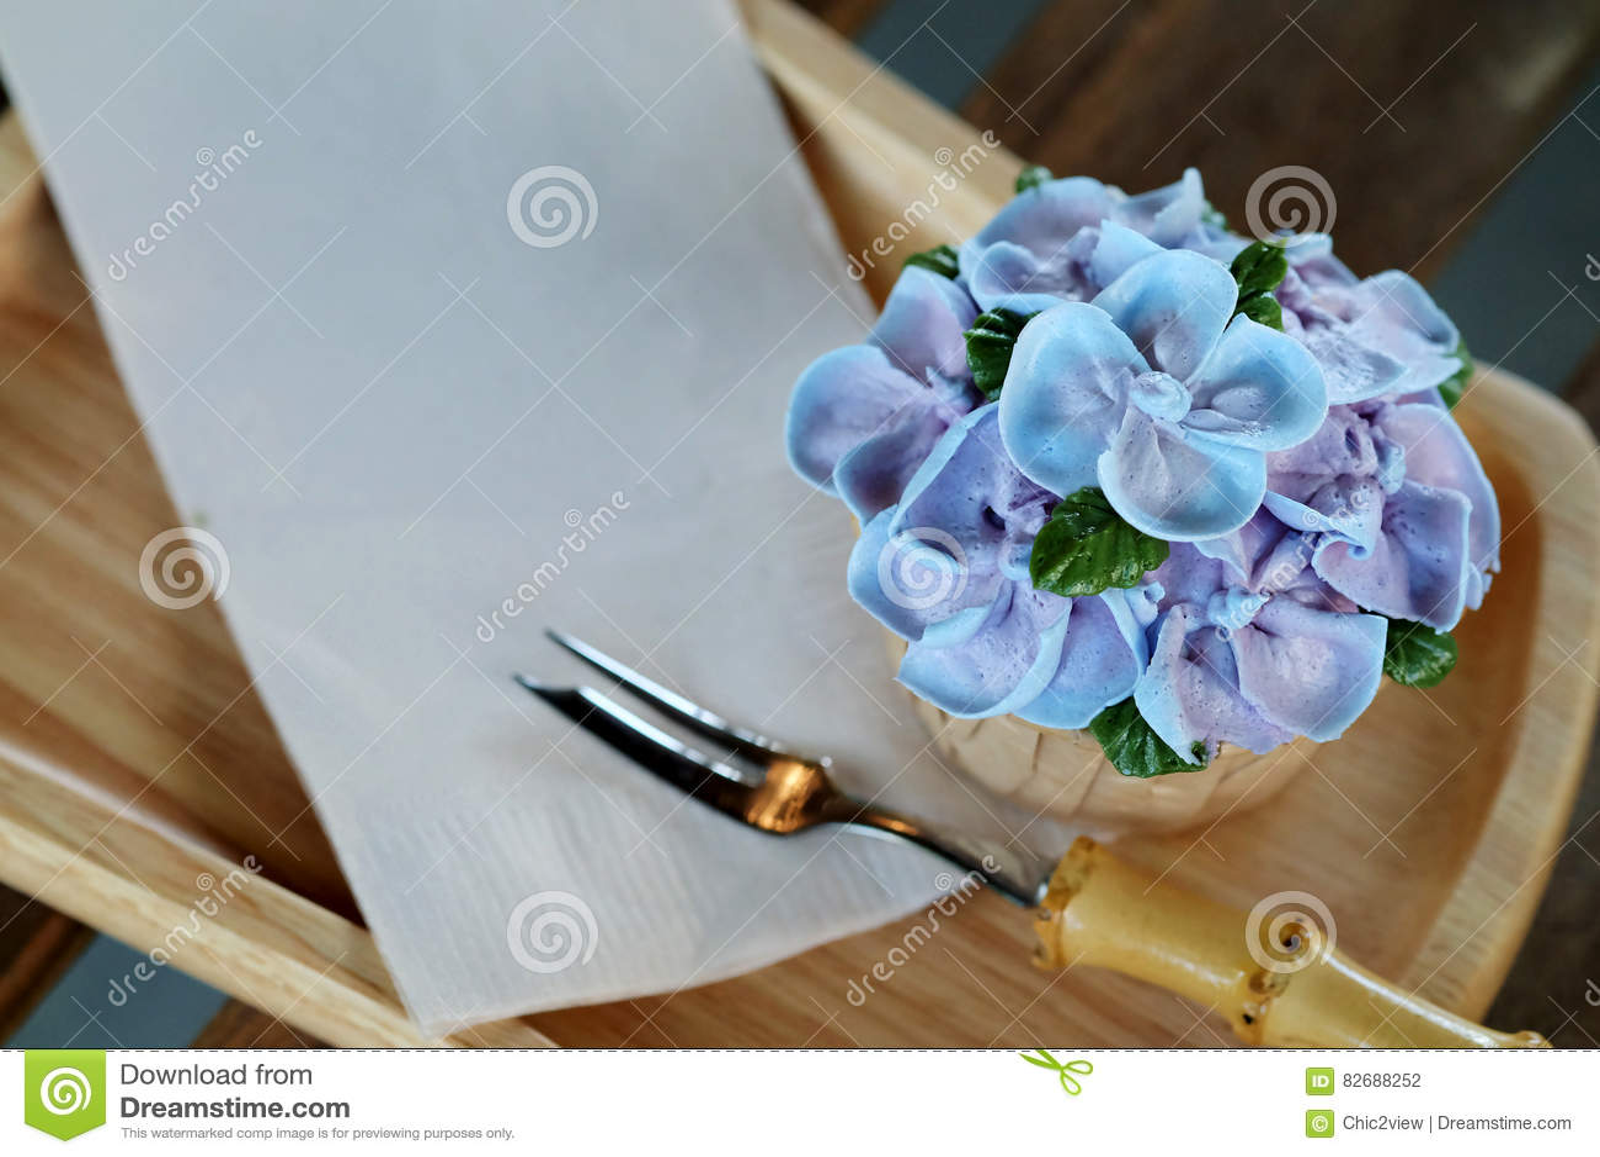 Blue Cupcake Design Cream Like Blue Hydrangea Flower Served On